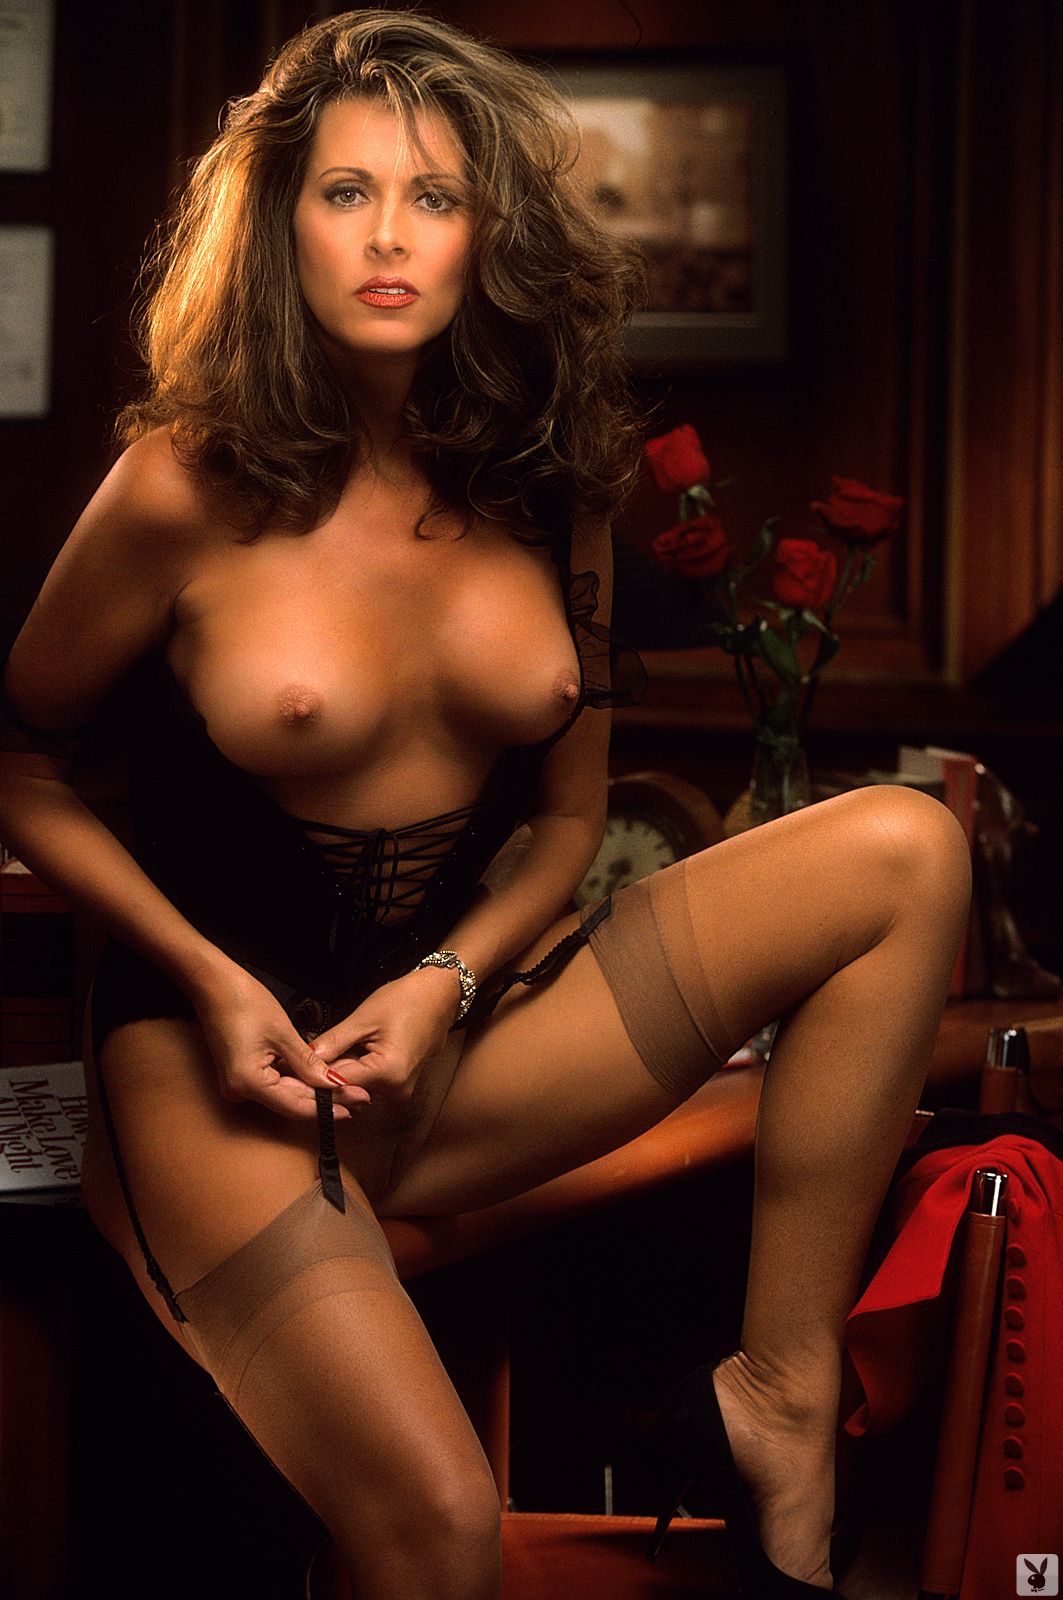 Barbara goenaga nude